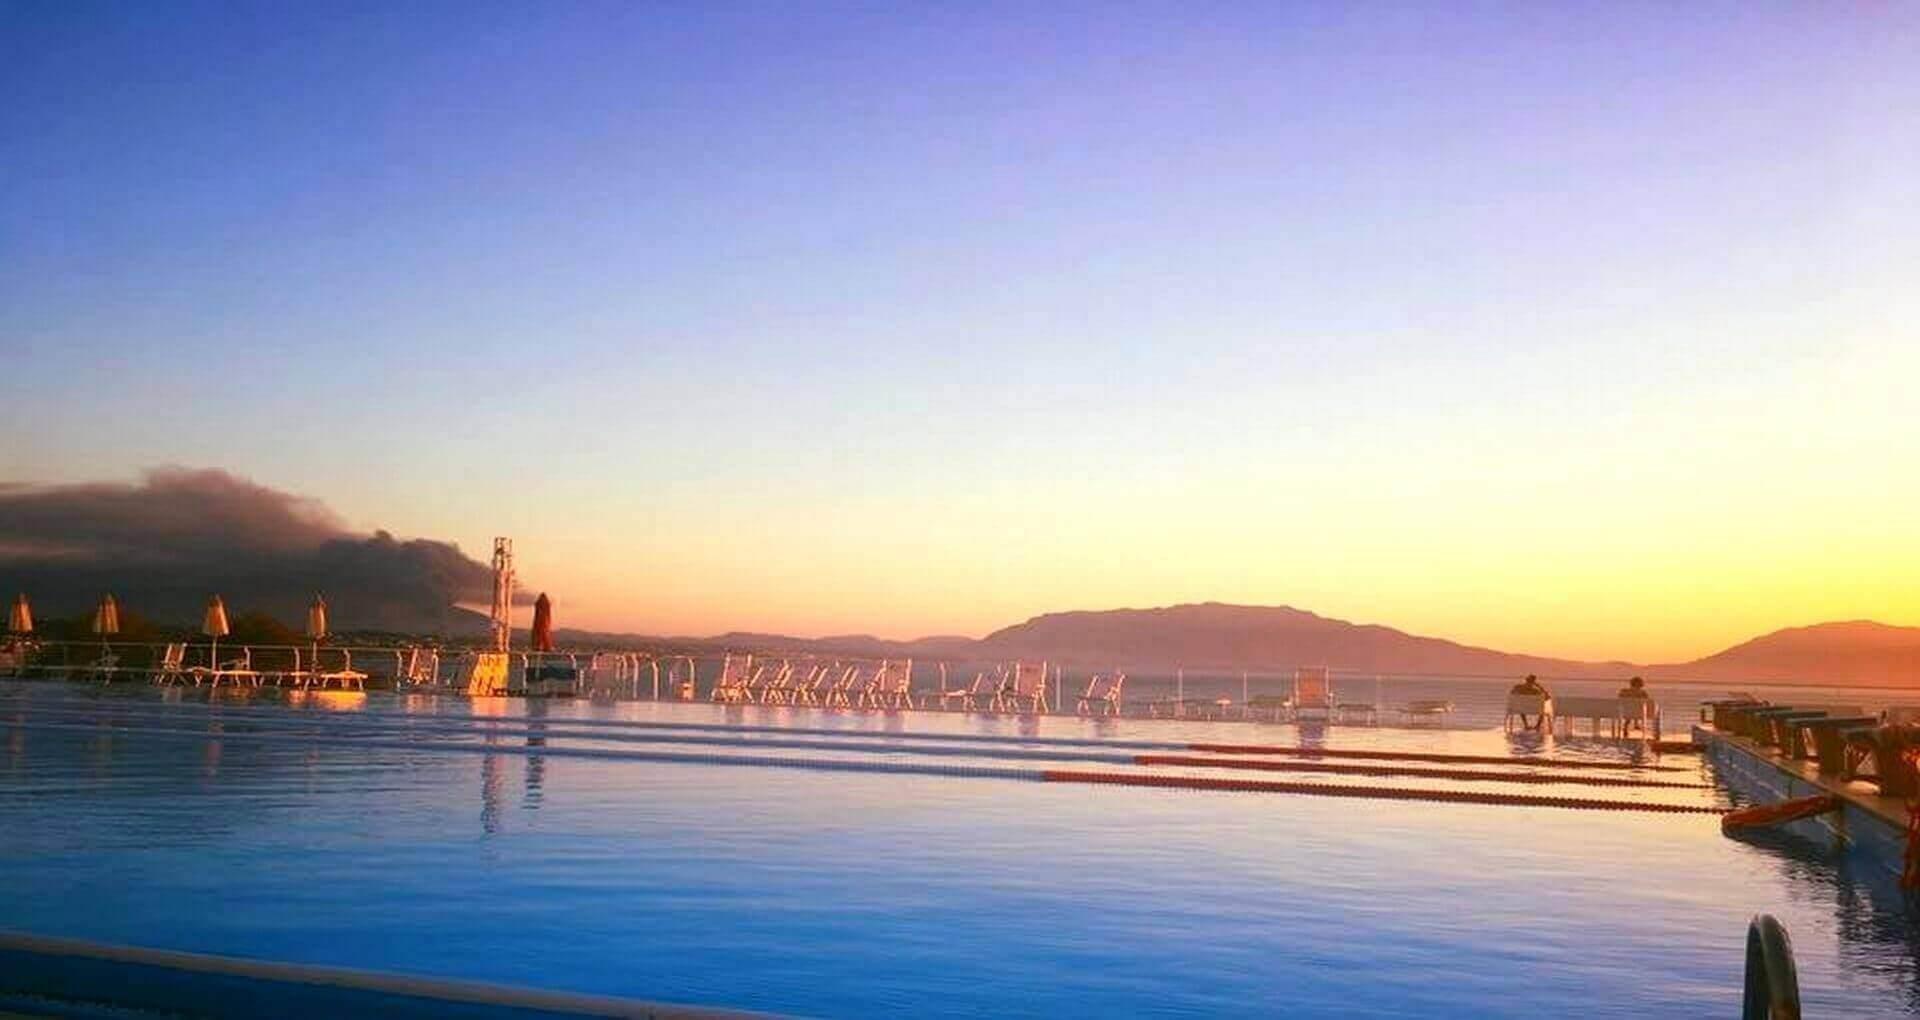 Piscina_Olimpionica_Perla_del_Golfo_Resort